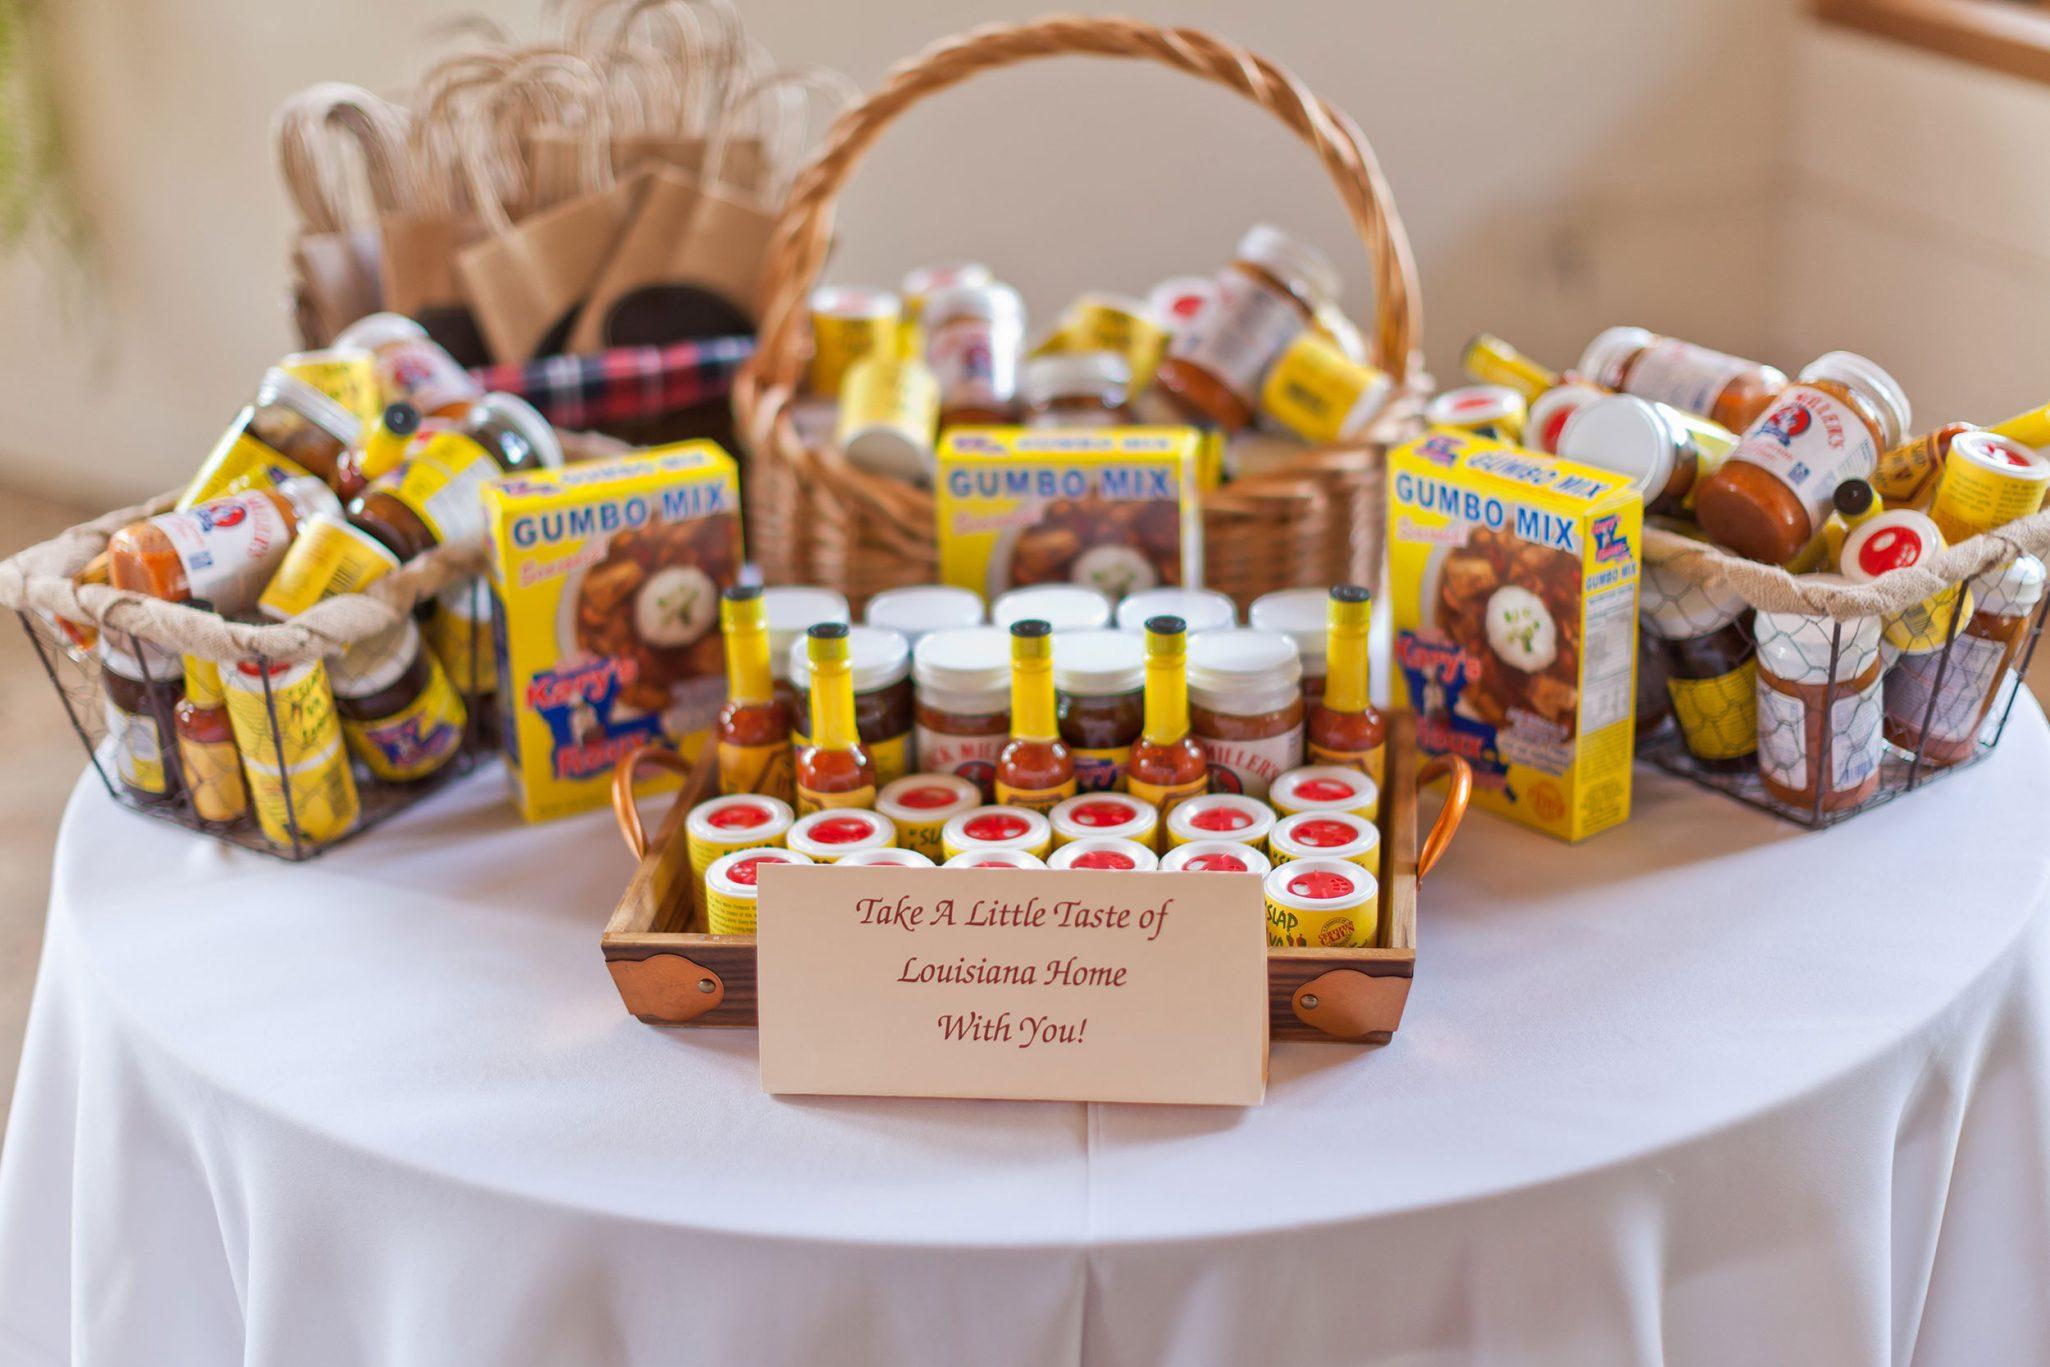 Wedding favors with Louisiana flavor